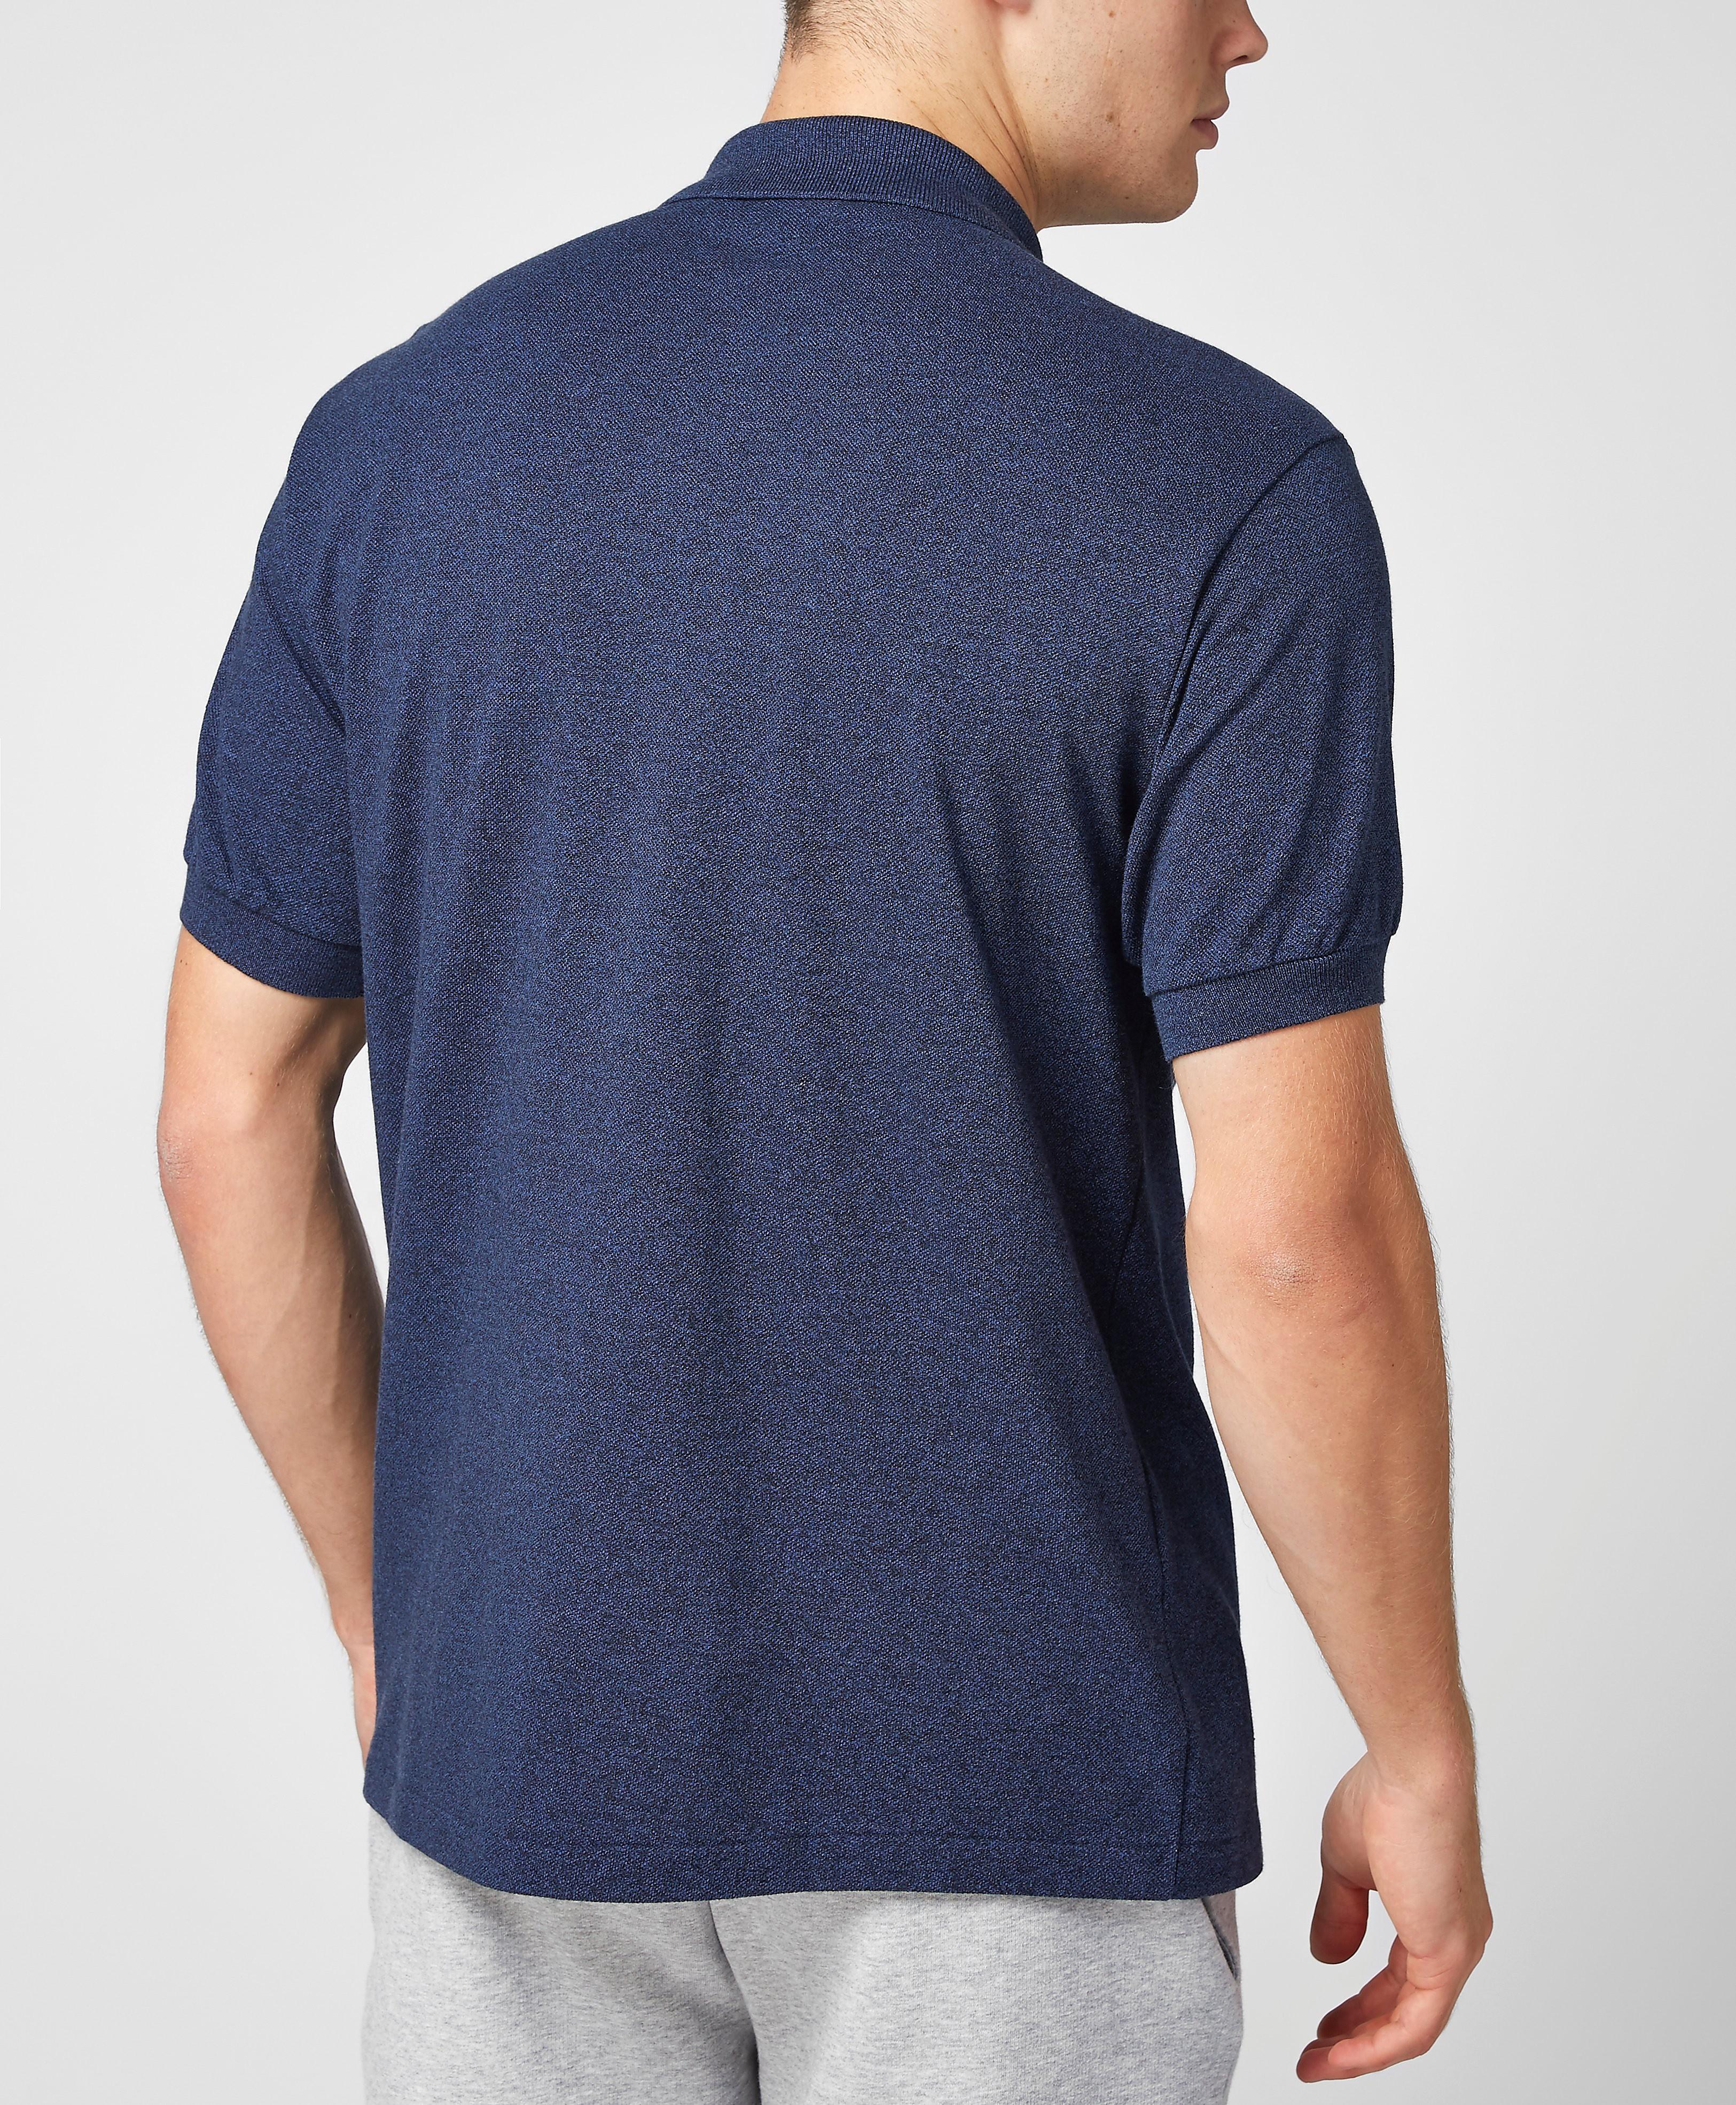 Lacoste L1264 Polo Shirt